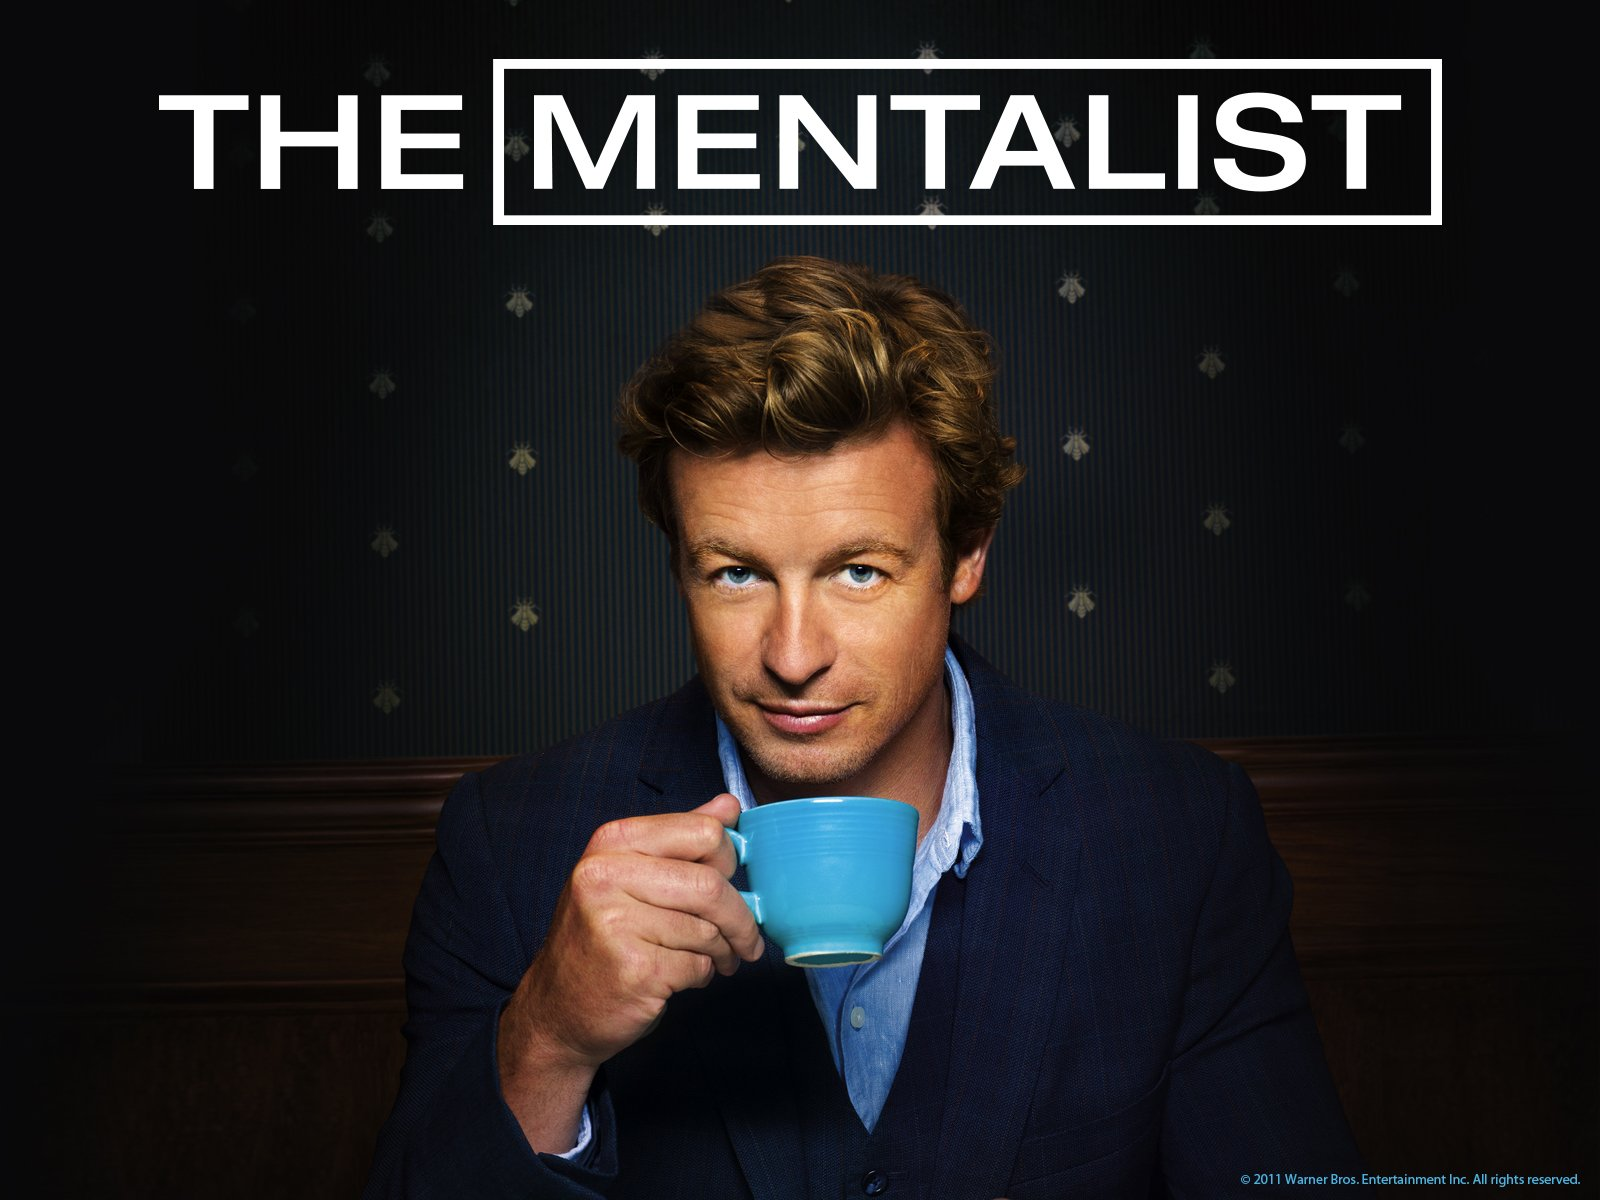 Amazon co uk: Watch The Mentalist - Season 5 | Prime Video